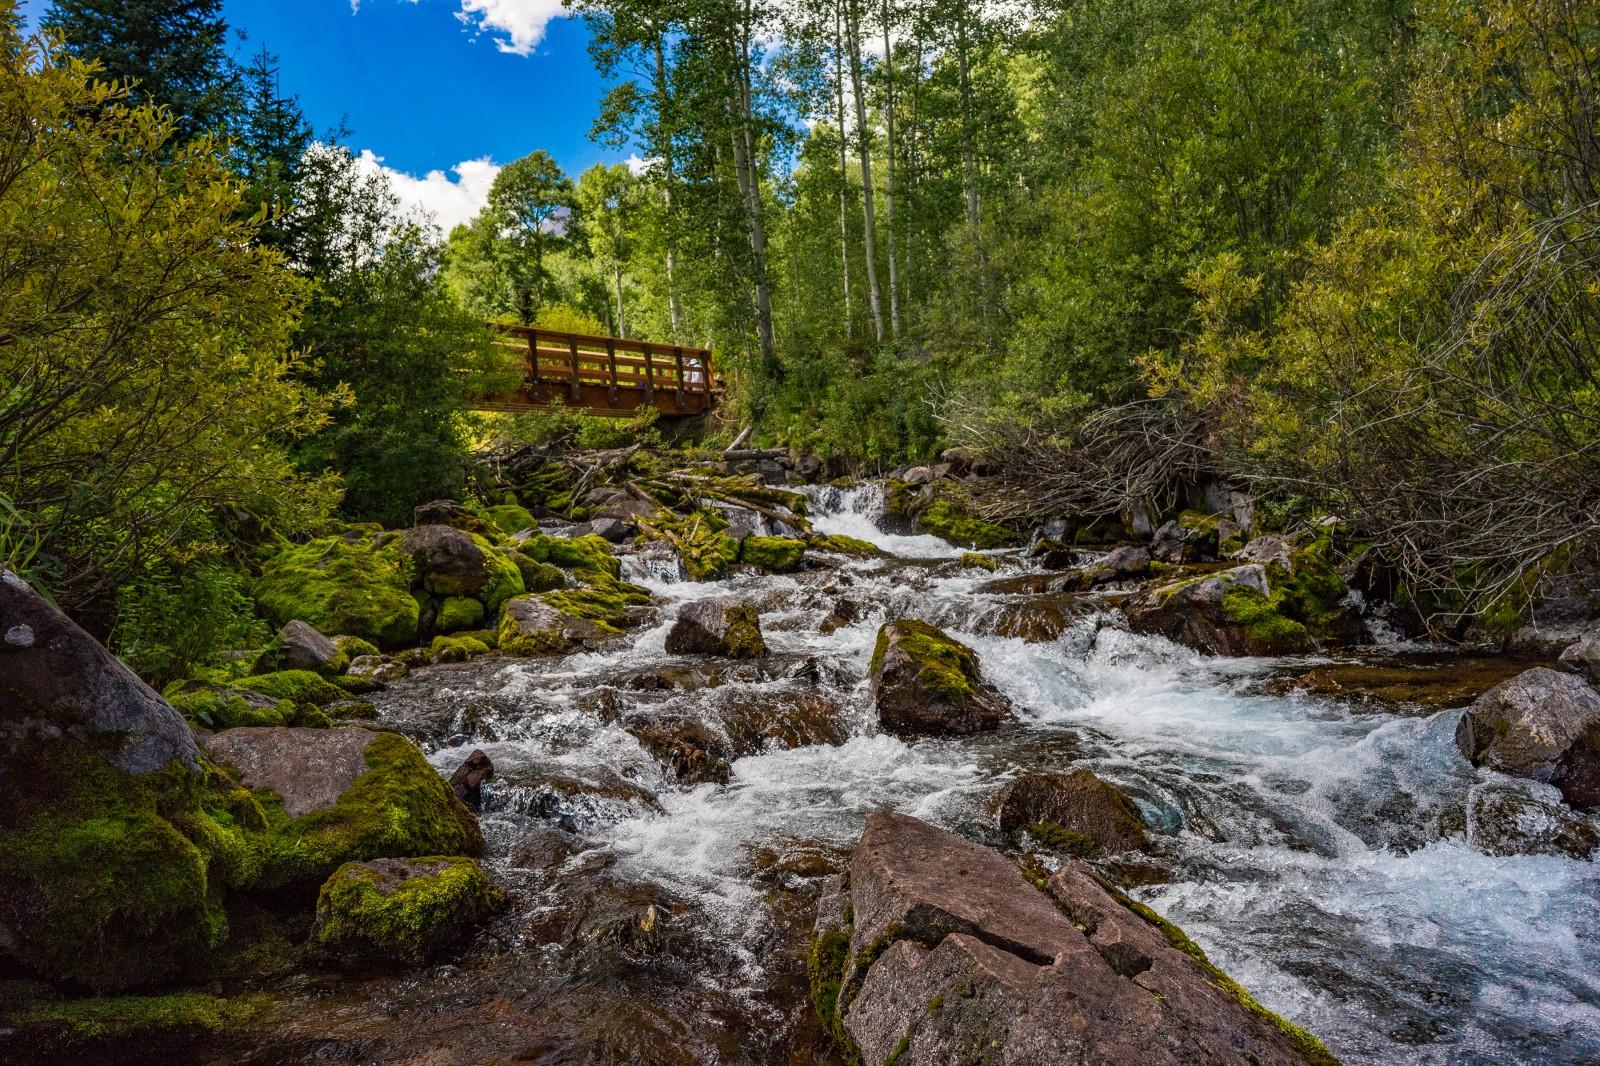 White River, Snowmass Wilderness, Colorado